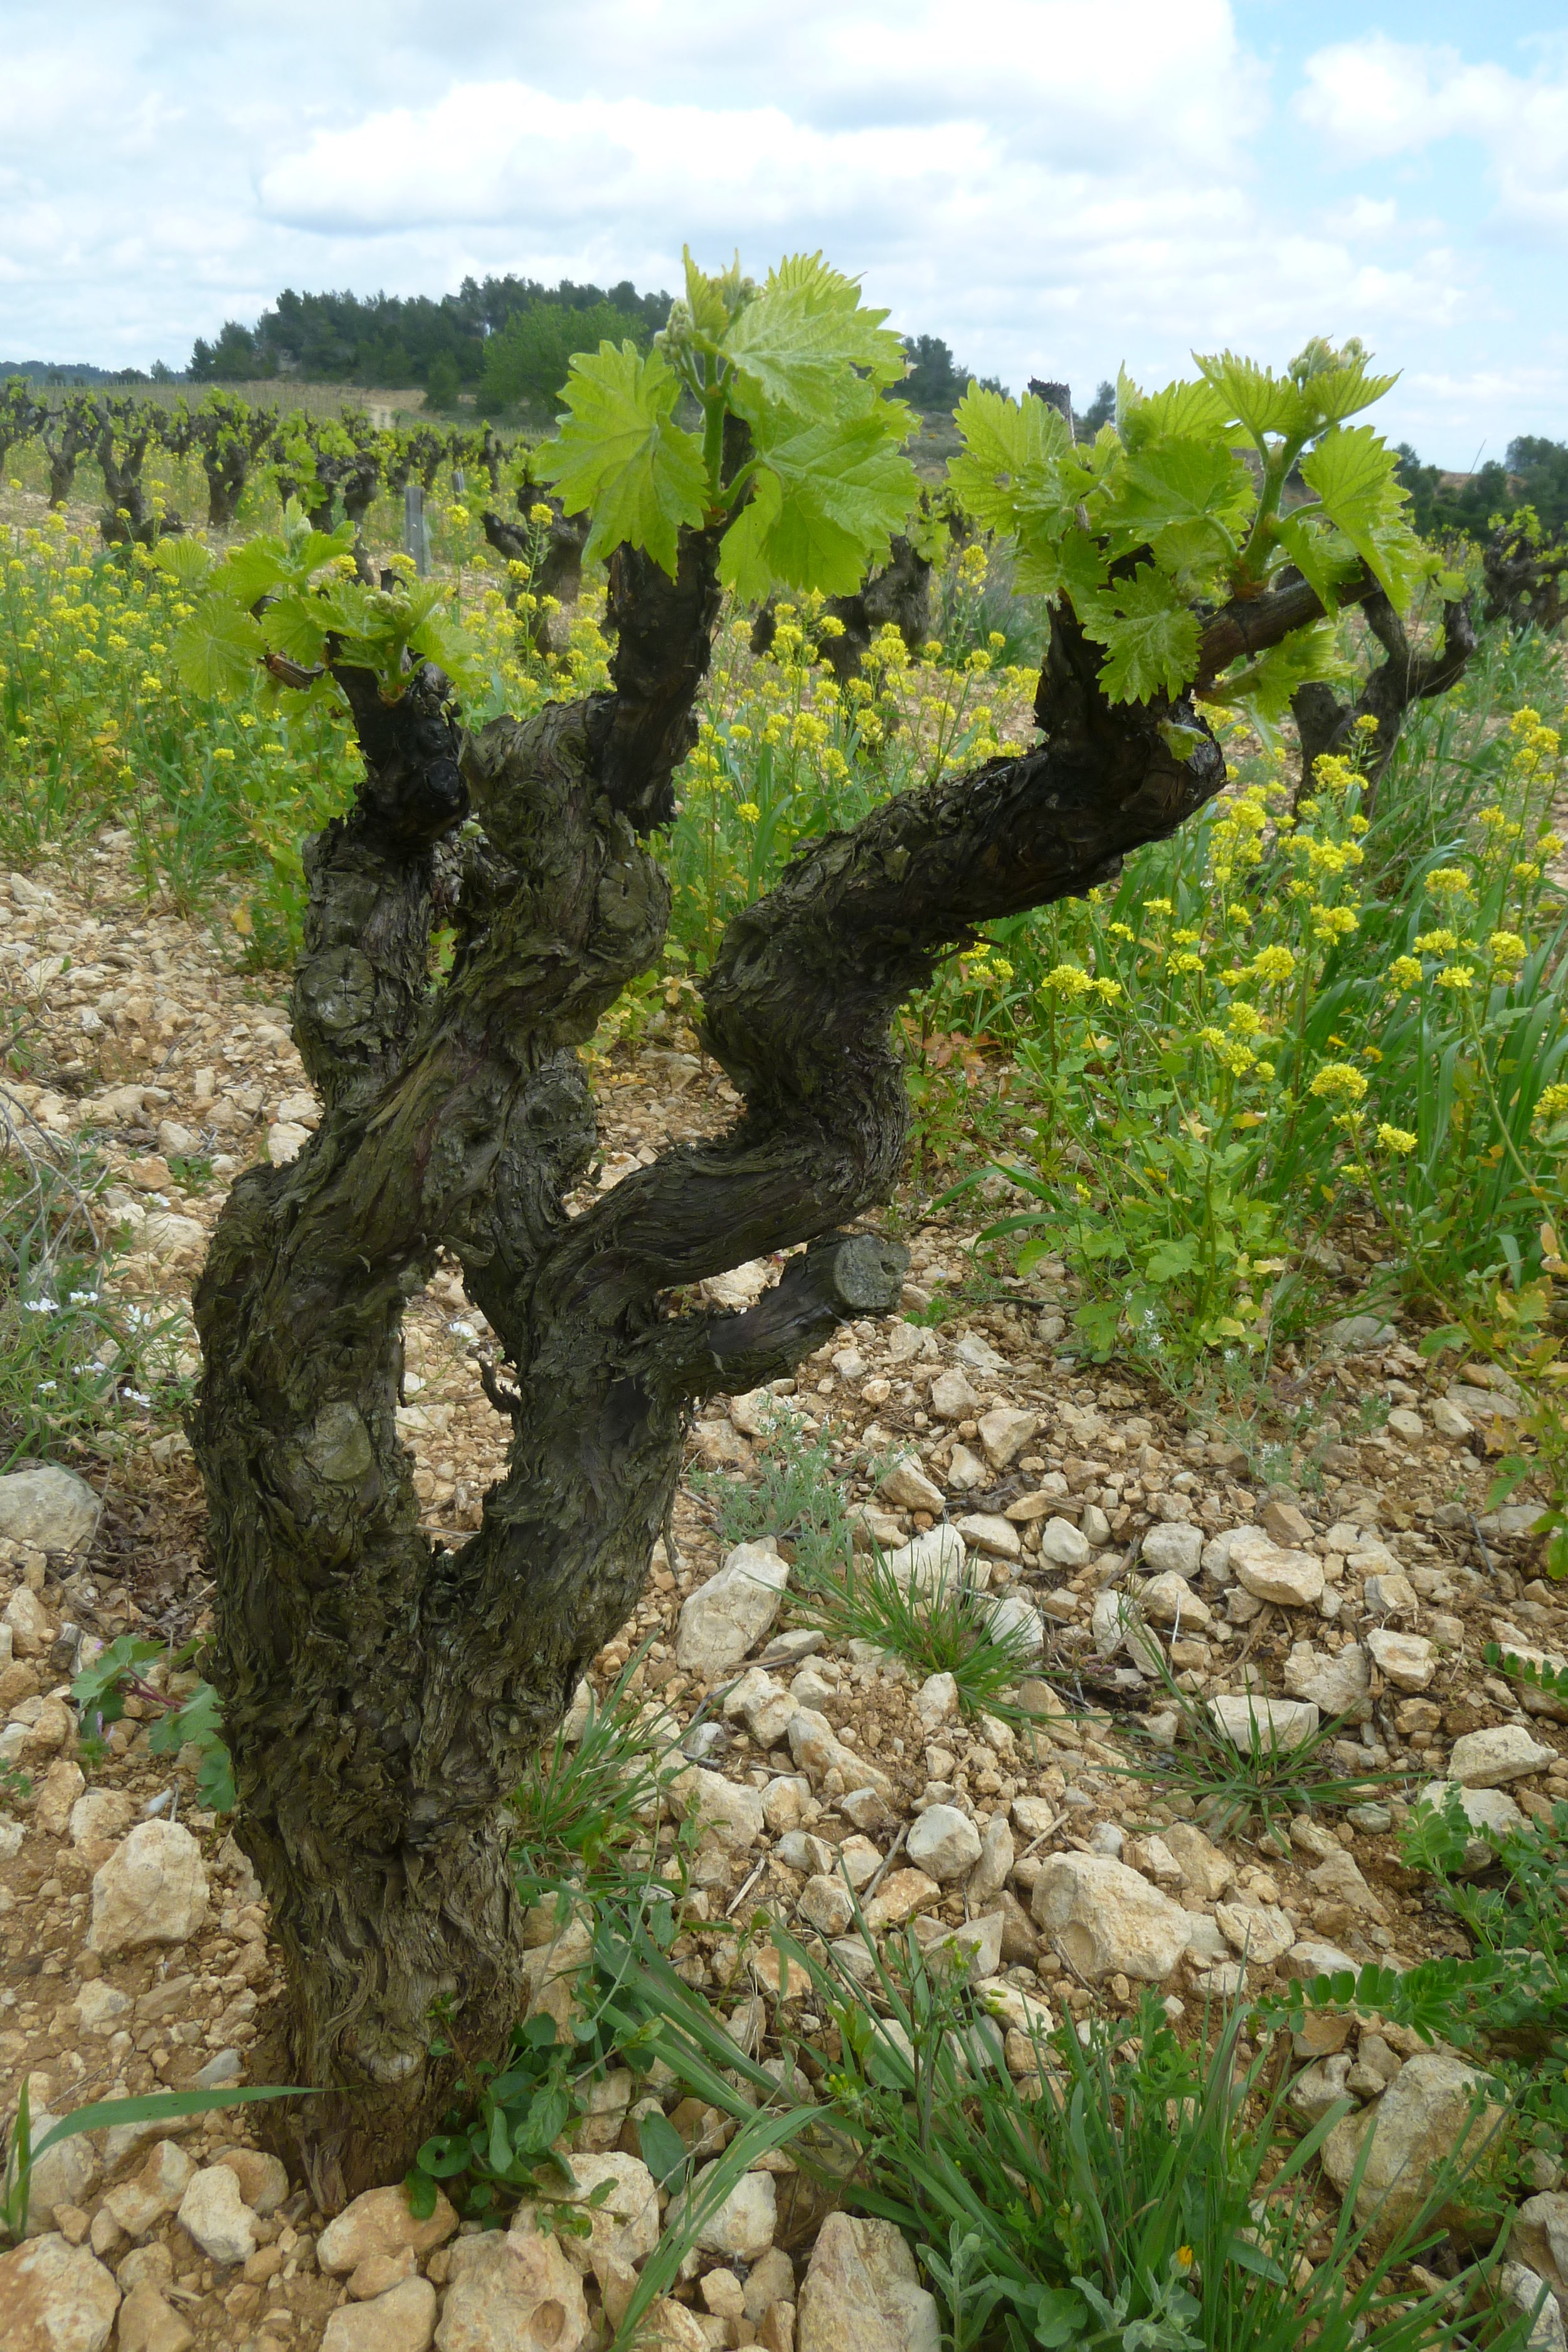 Carignan vines - Les Anciens - jacques herviou.JPG